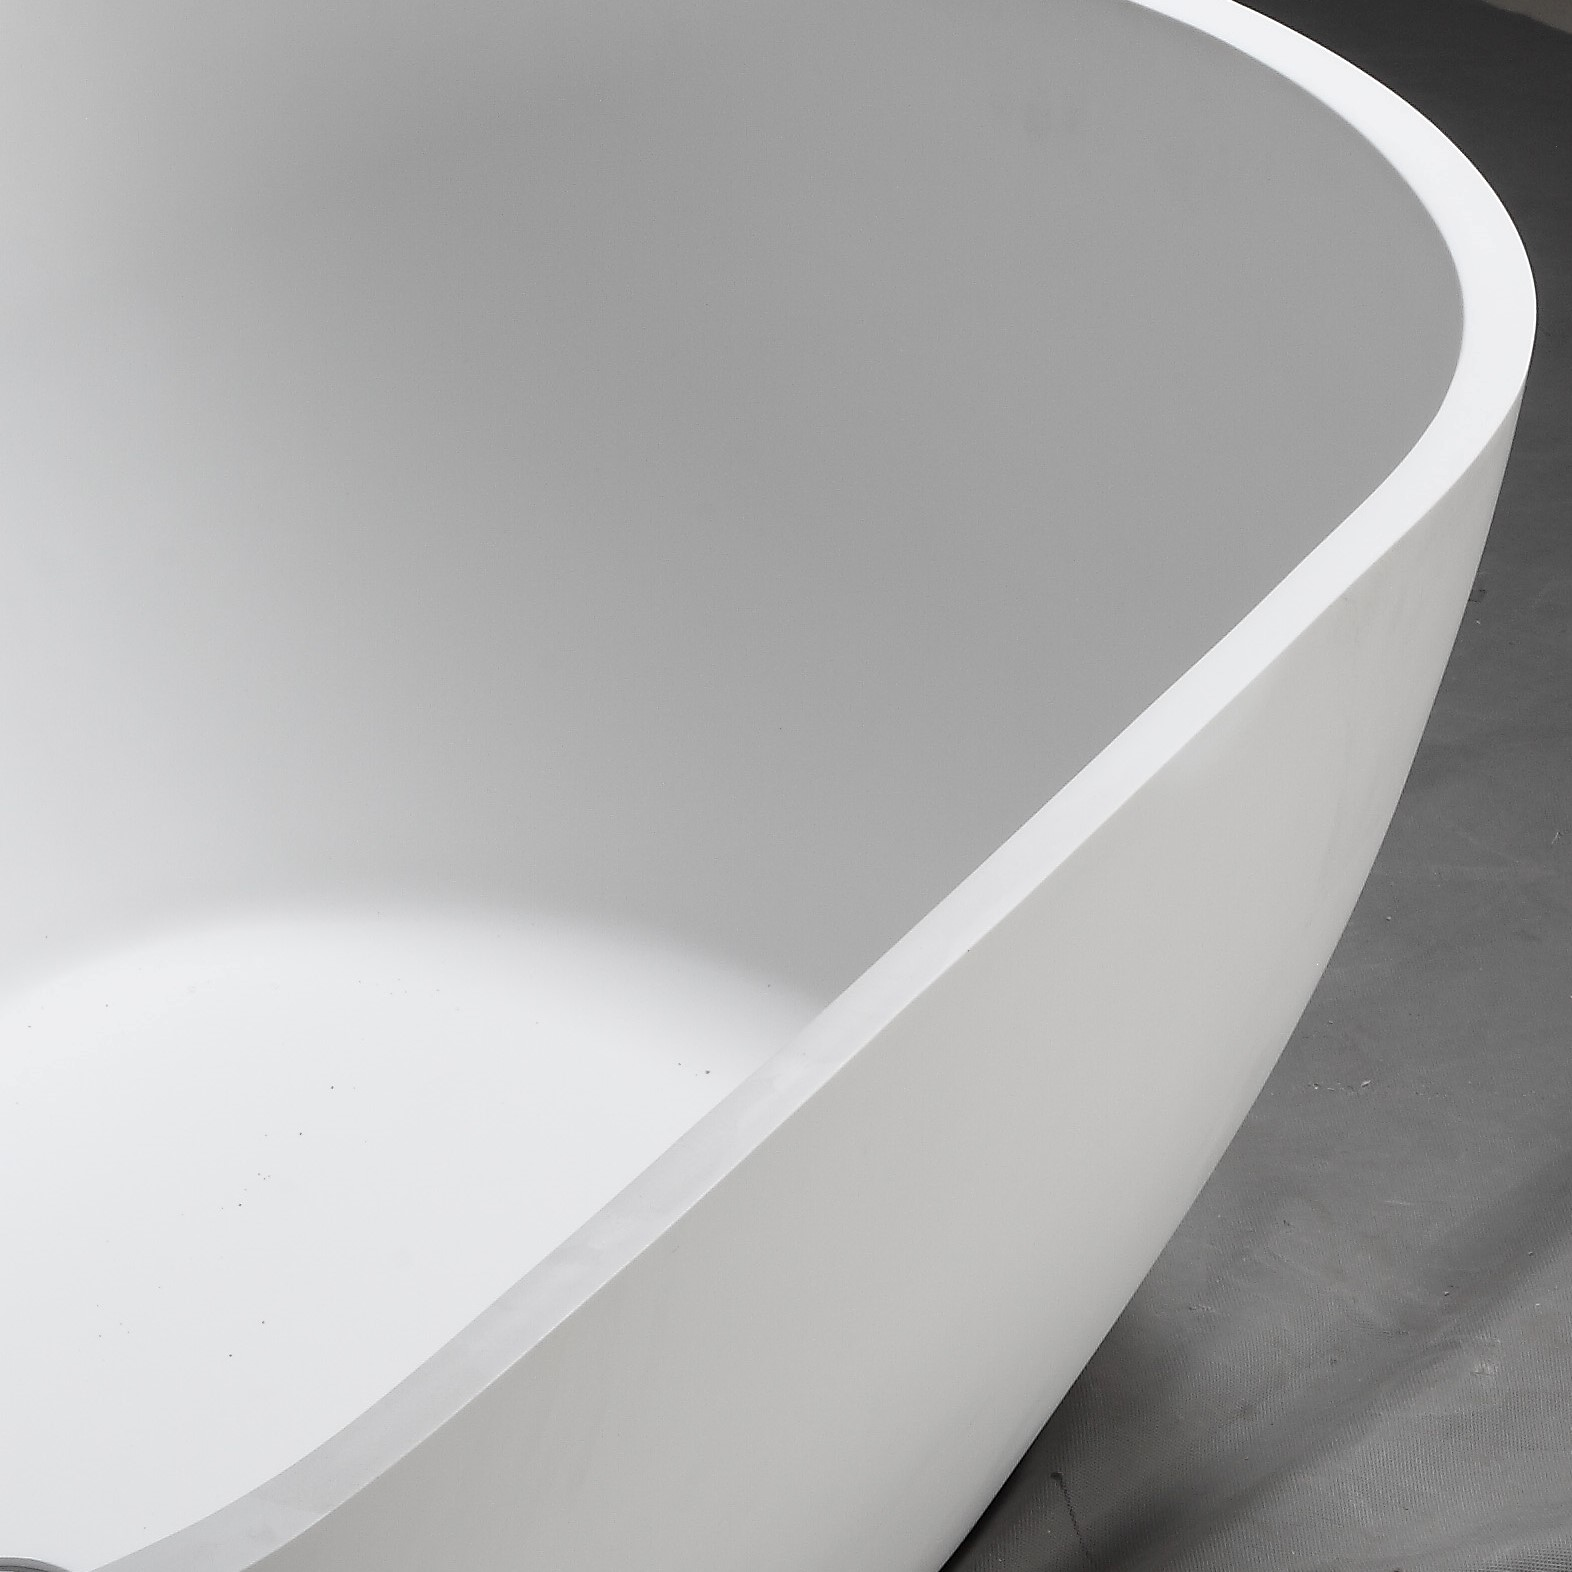 Bellissimo-Stone resin solid surface design freestanding floor mounted bathtub-7